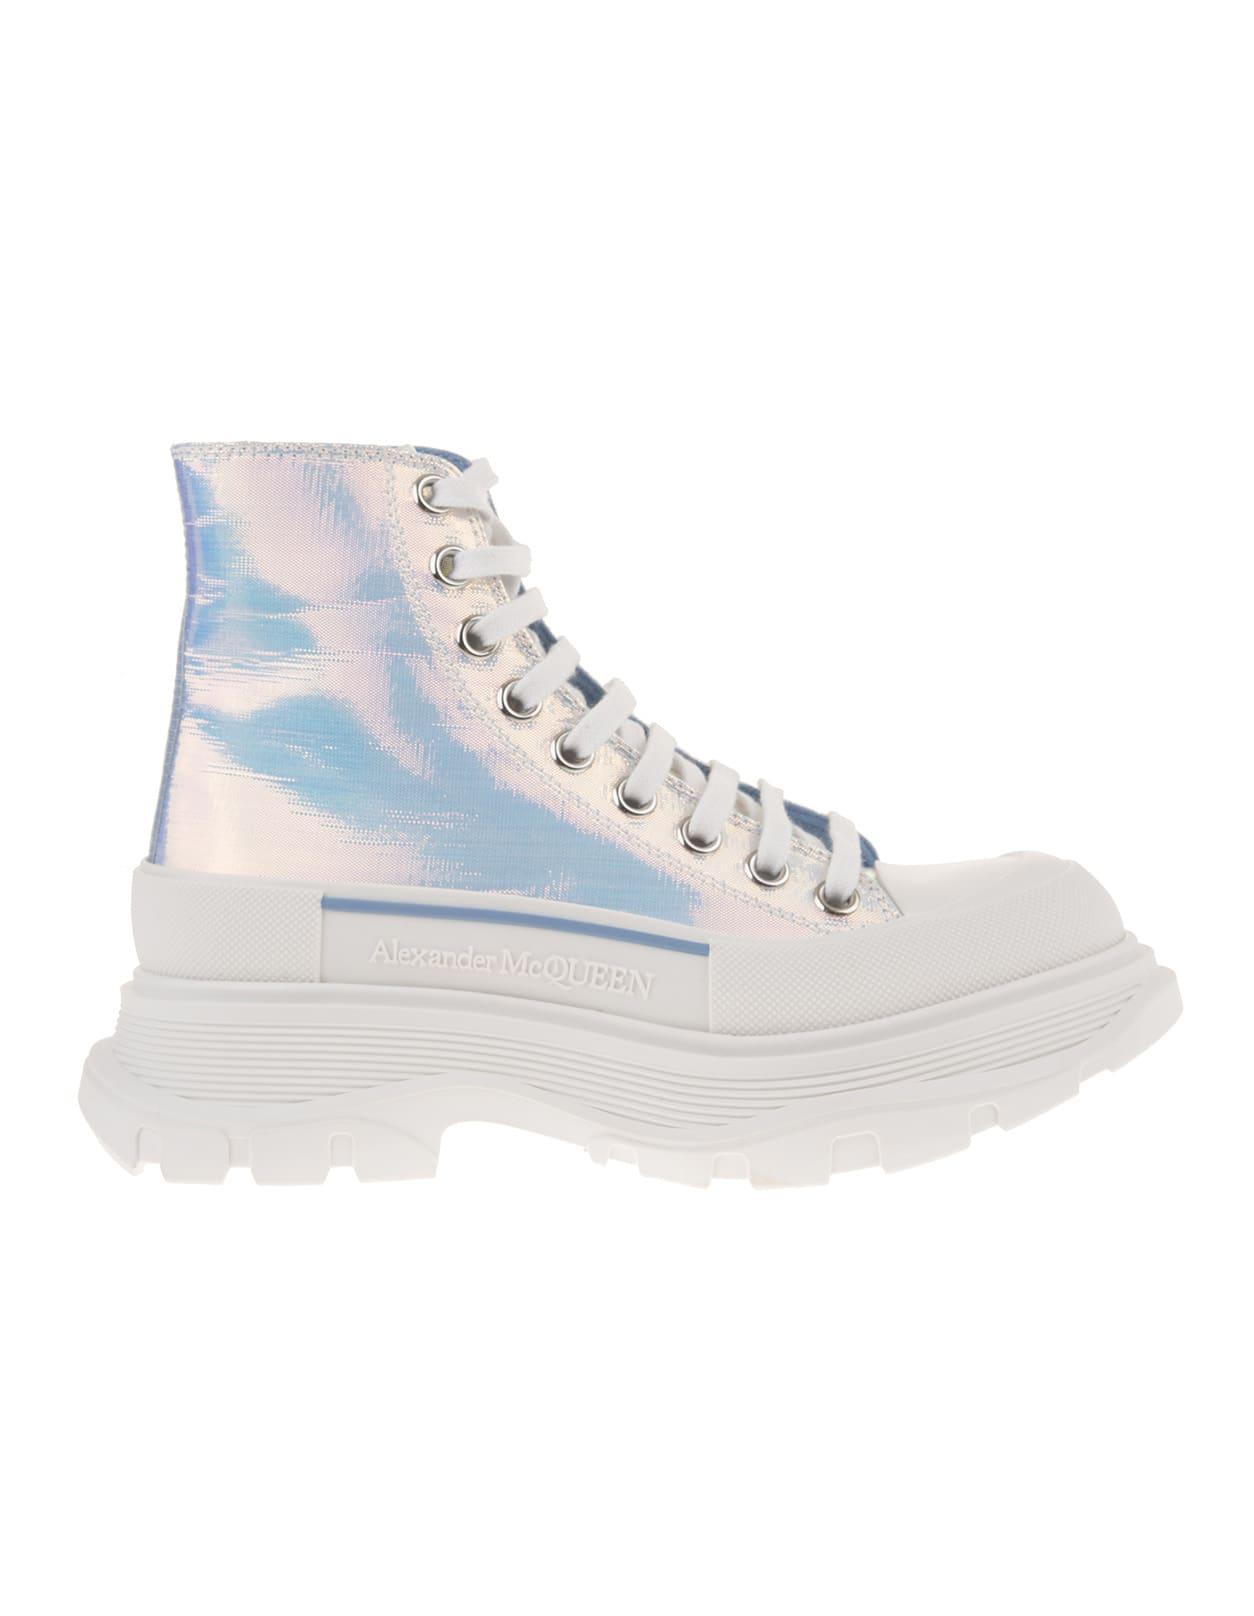 Alexander McQueen Woman Iridescent Tread Slick Lace-up High Sneakers